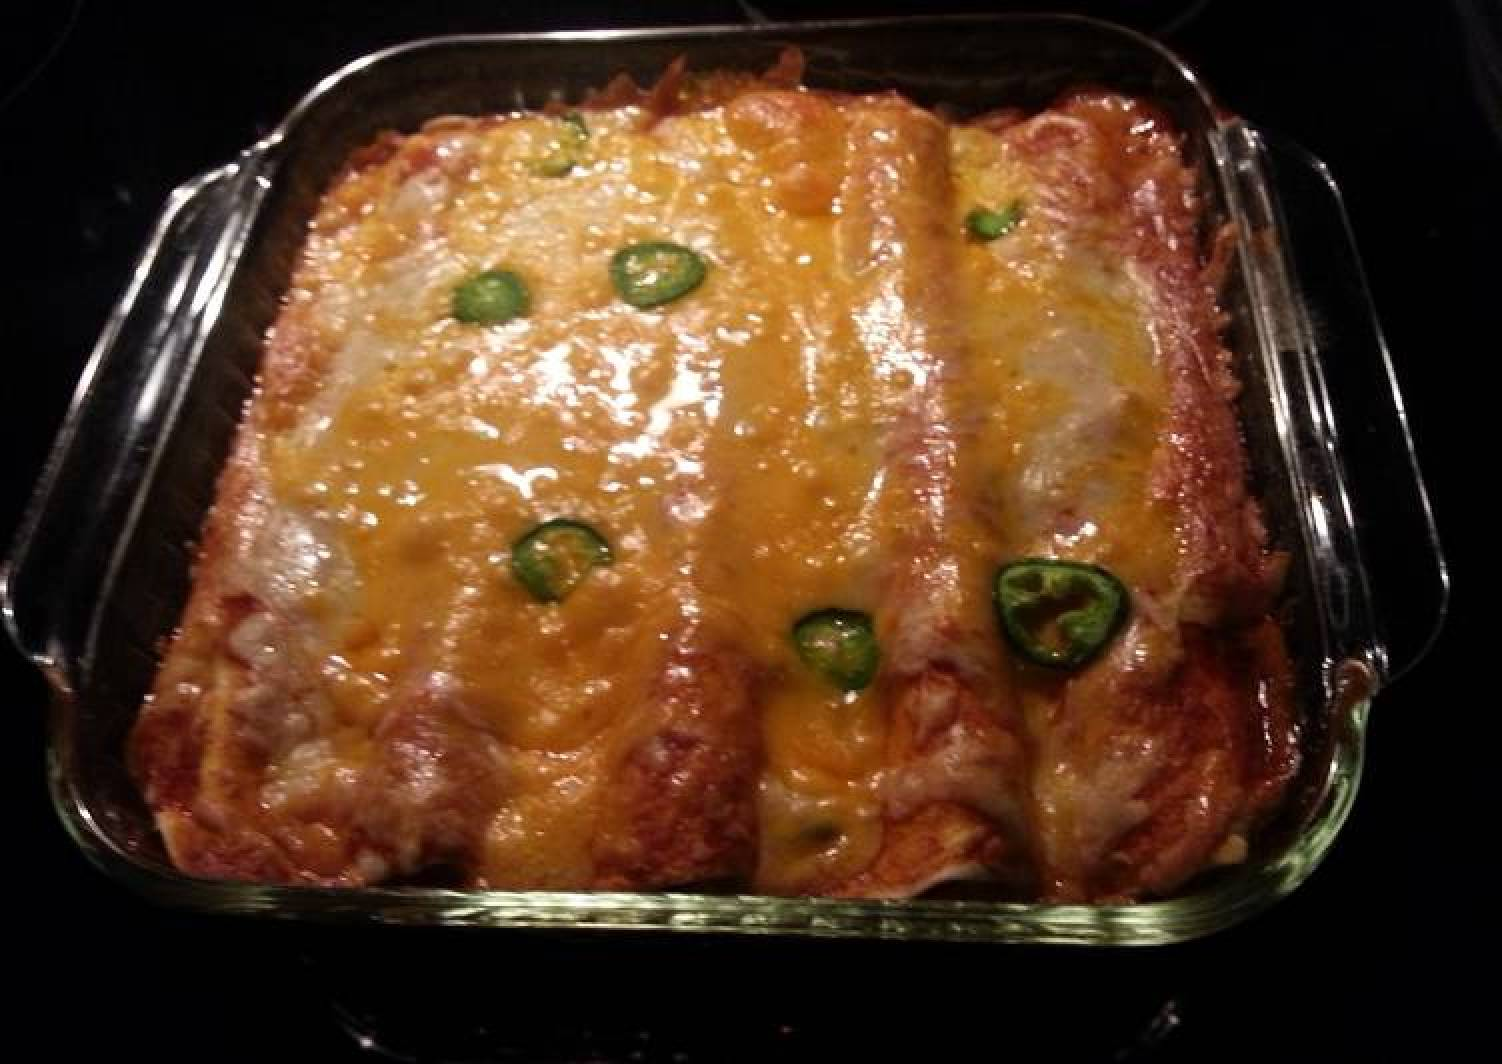 Turkey enchiladas!